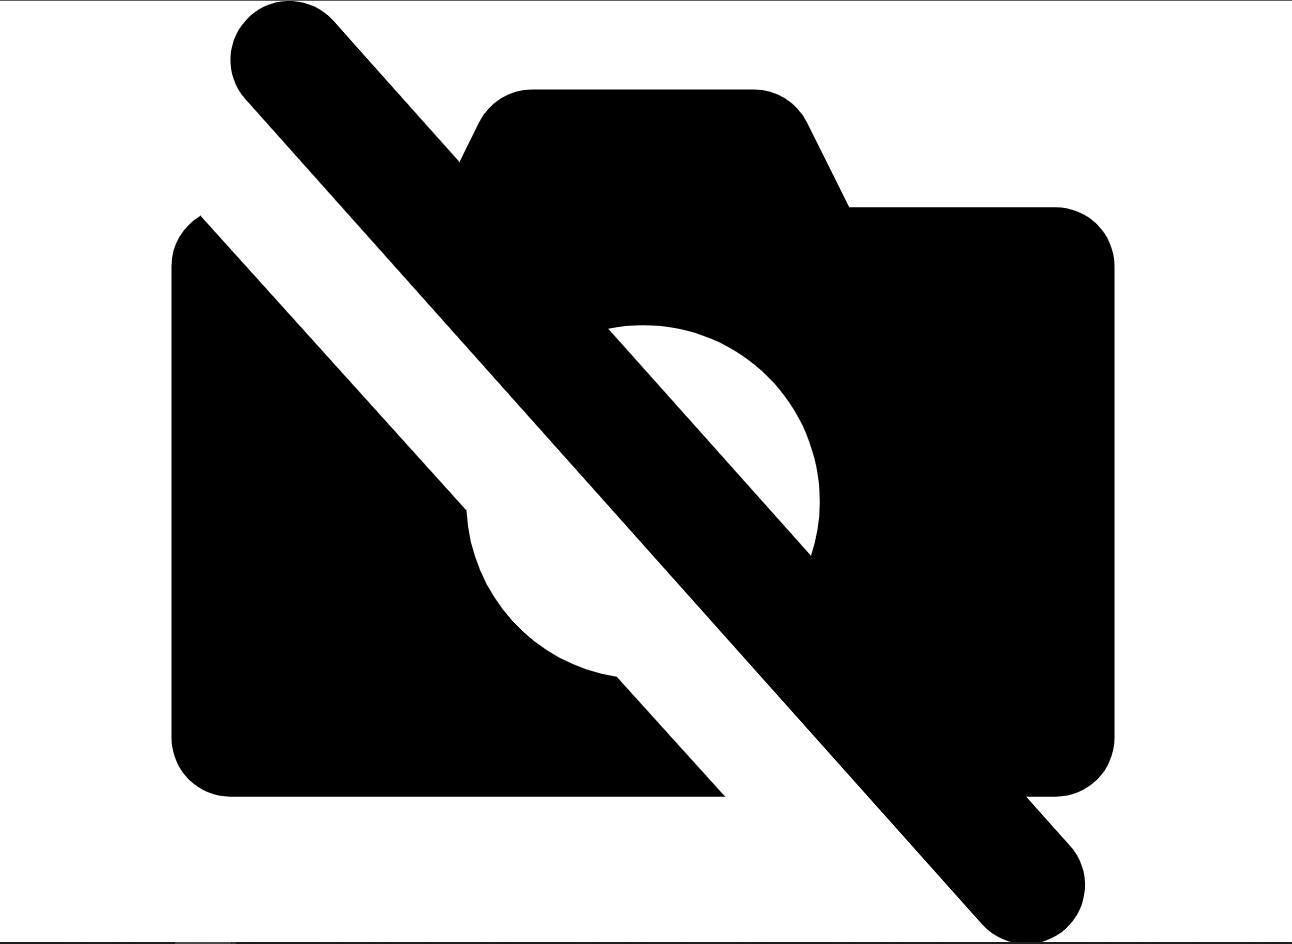 Kit Pis/anel Metal Leve Biz125 0.50 9294